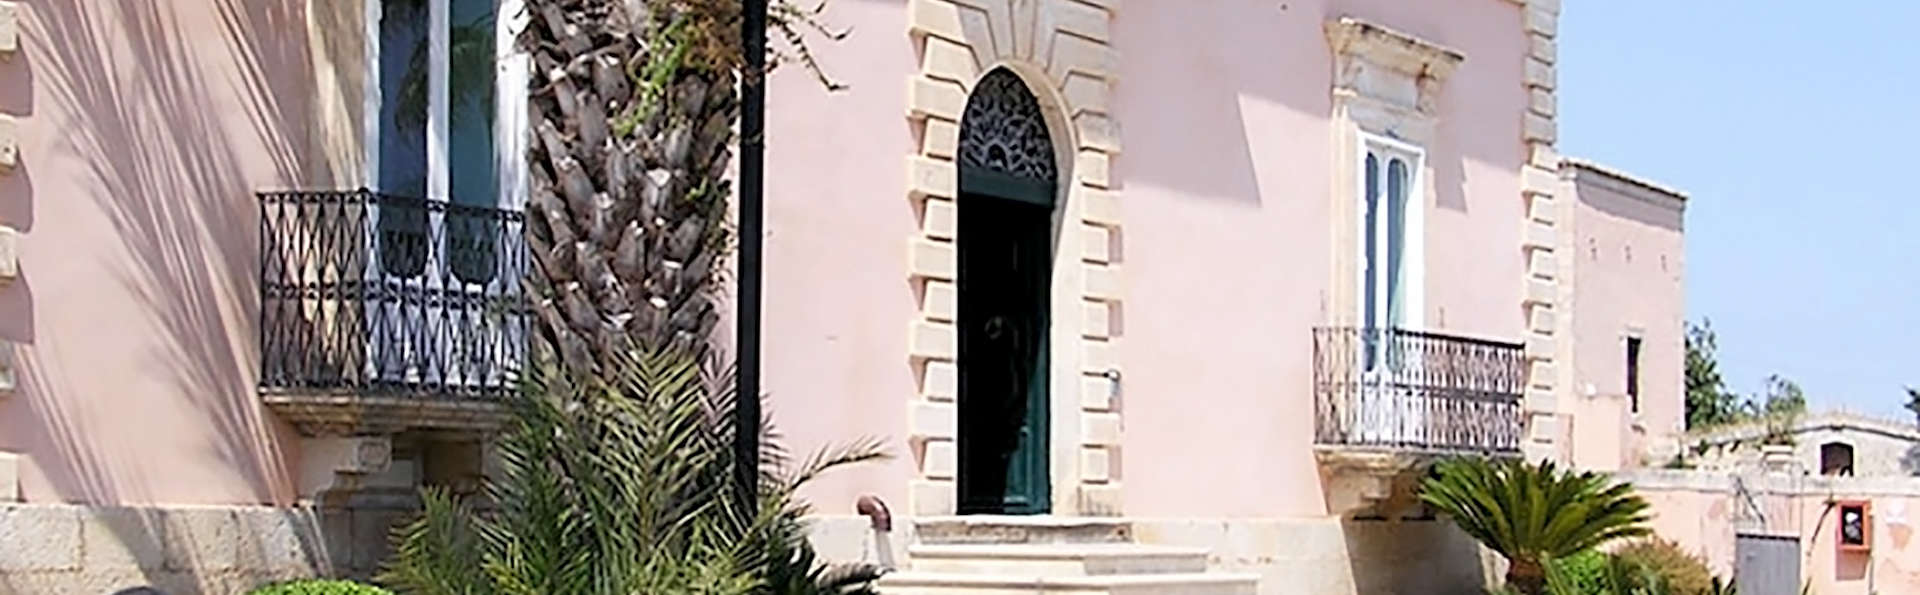 Villa Principe di Belmonte - Edit_Front3.jpg